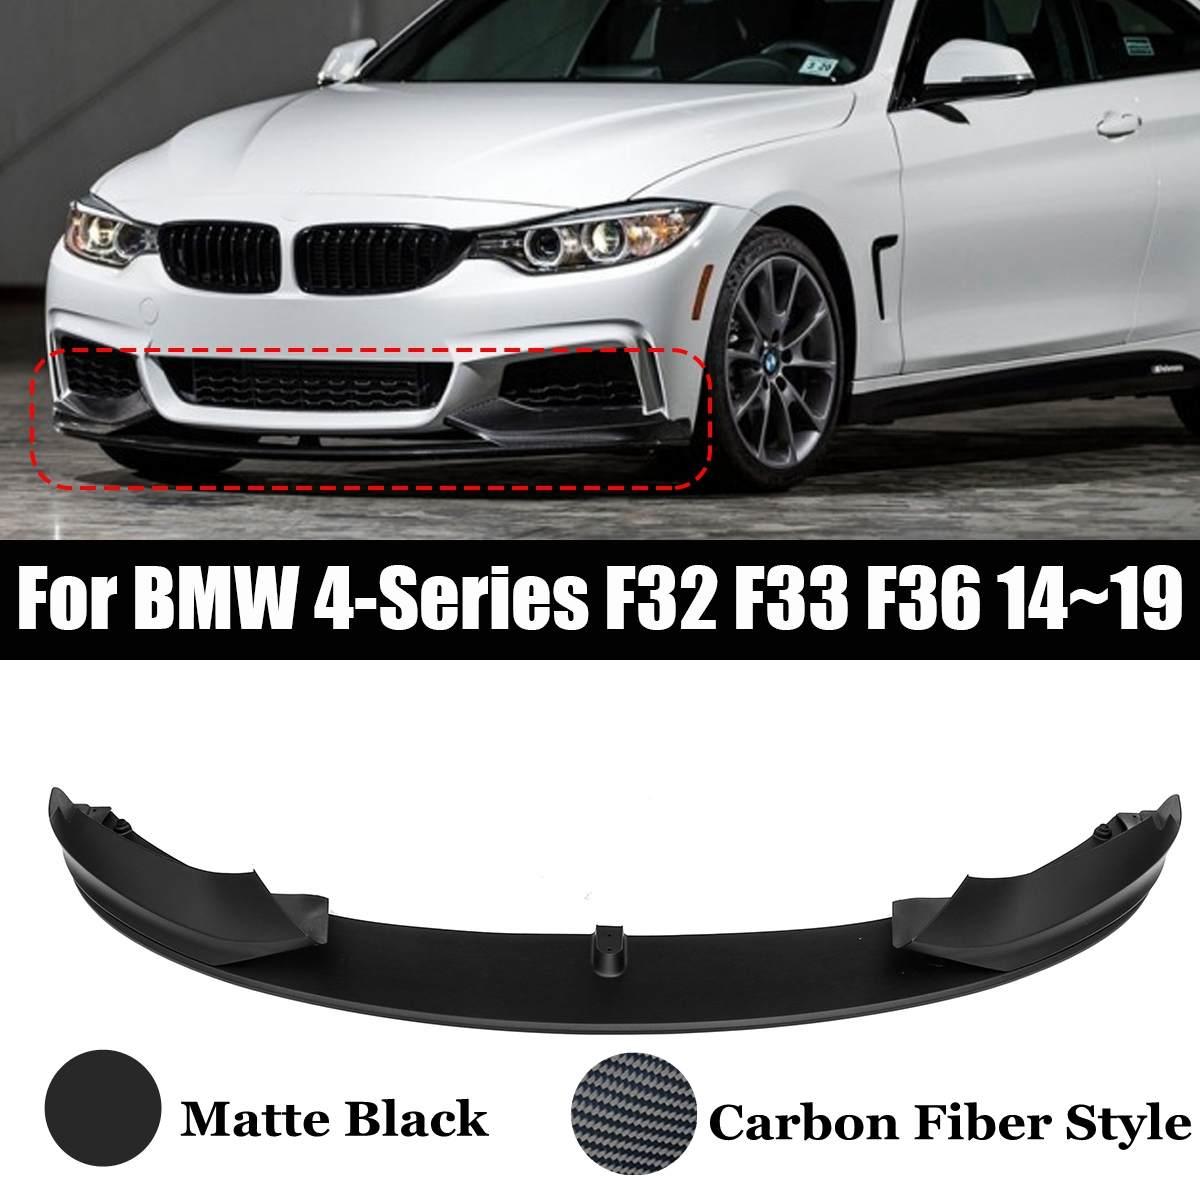 1PCS Auto Vorderen Stoßfänger Lip Spoiler Splitter Matte/Carbon Faser Stil Lip M Sport Stil Für BMW 4 -serie F32 F33 F36 2014 ~ 2019